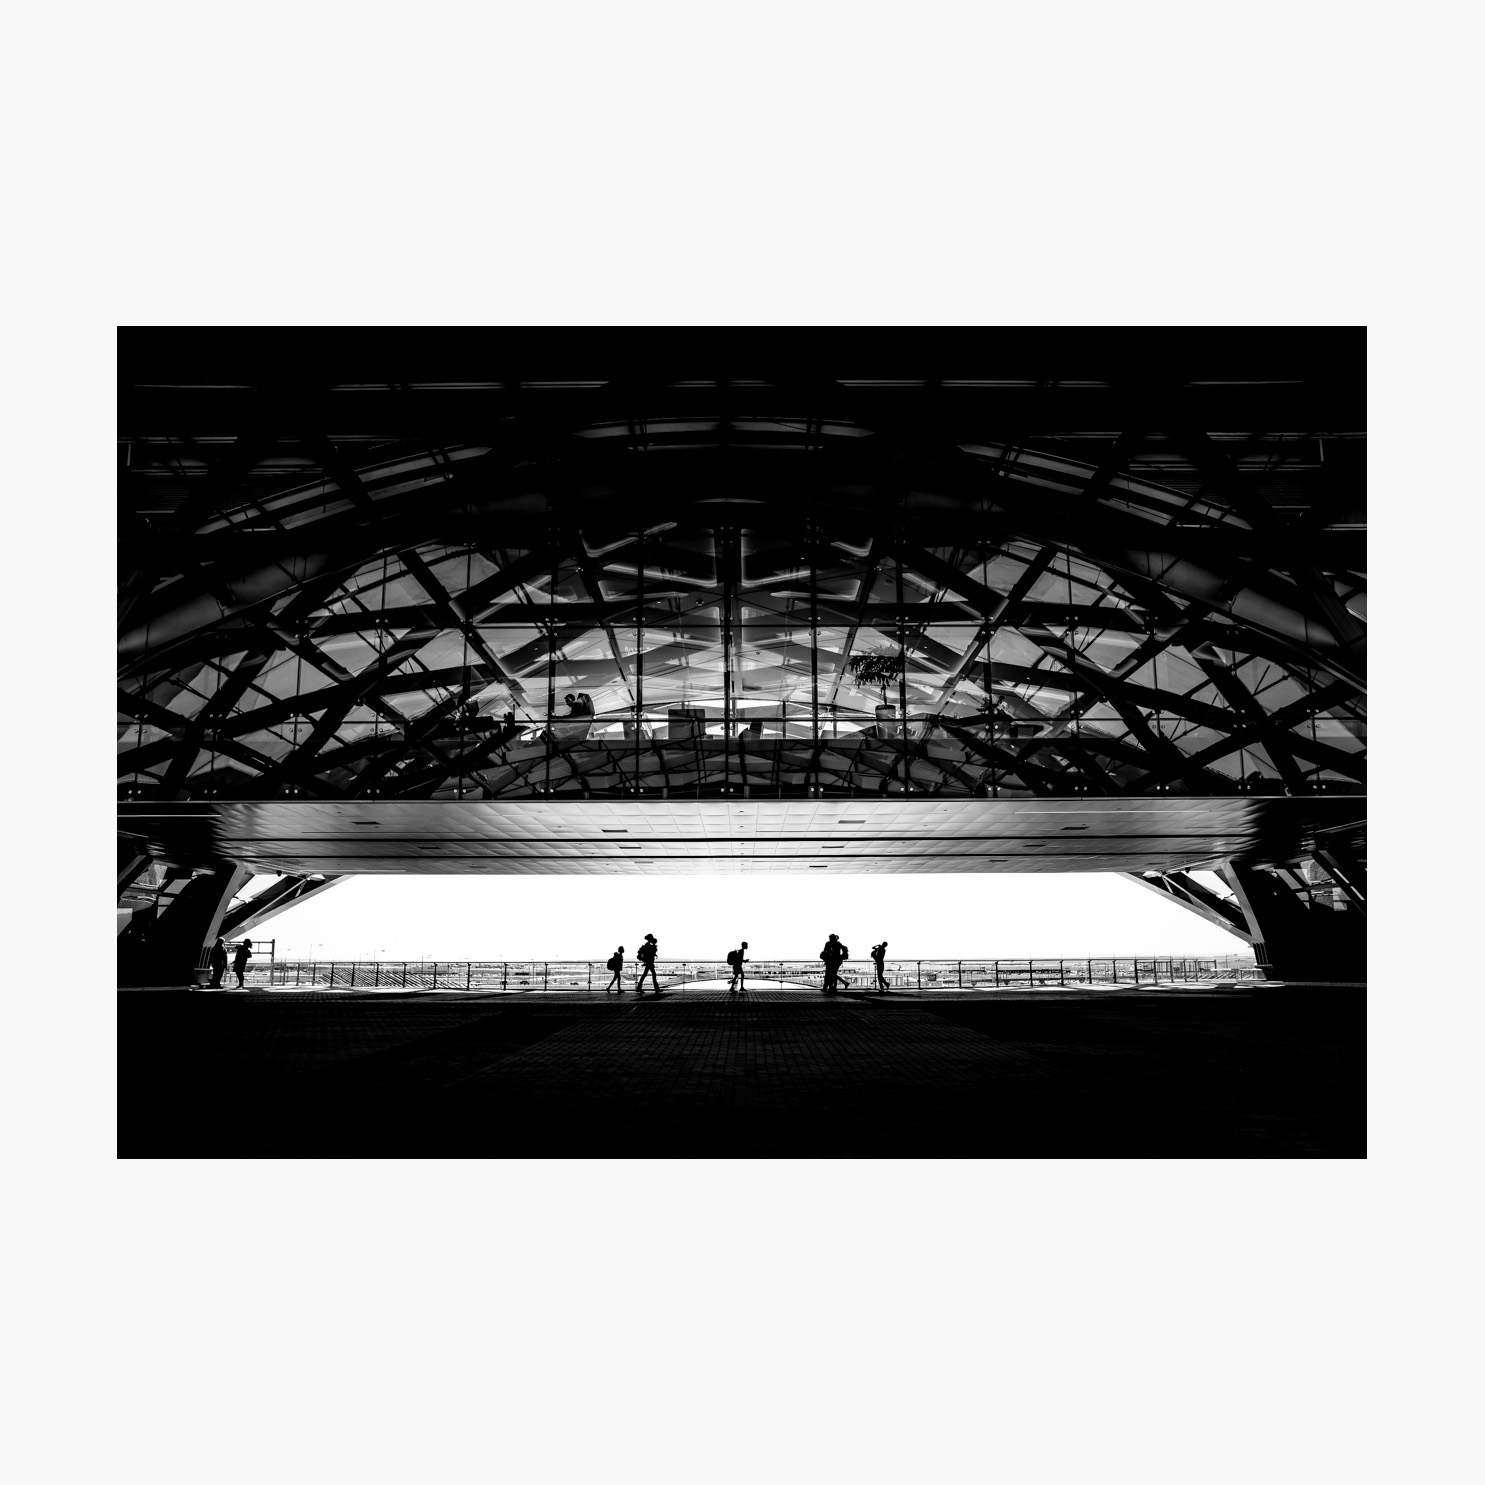 ©-2018-Harry-W-Edmonds-London-Photographer-The-Long-Road-PN01.jpg